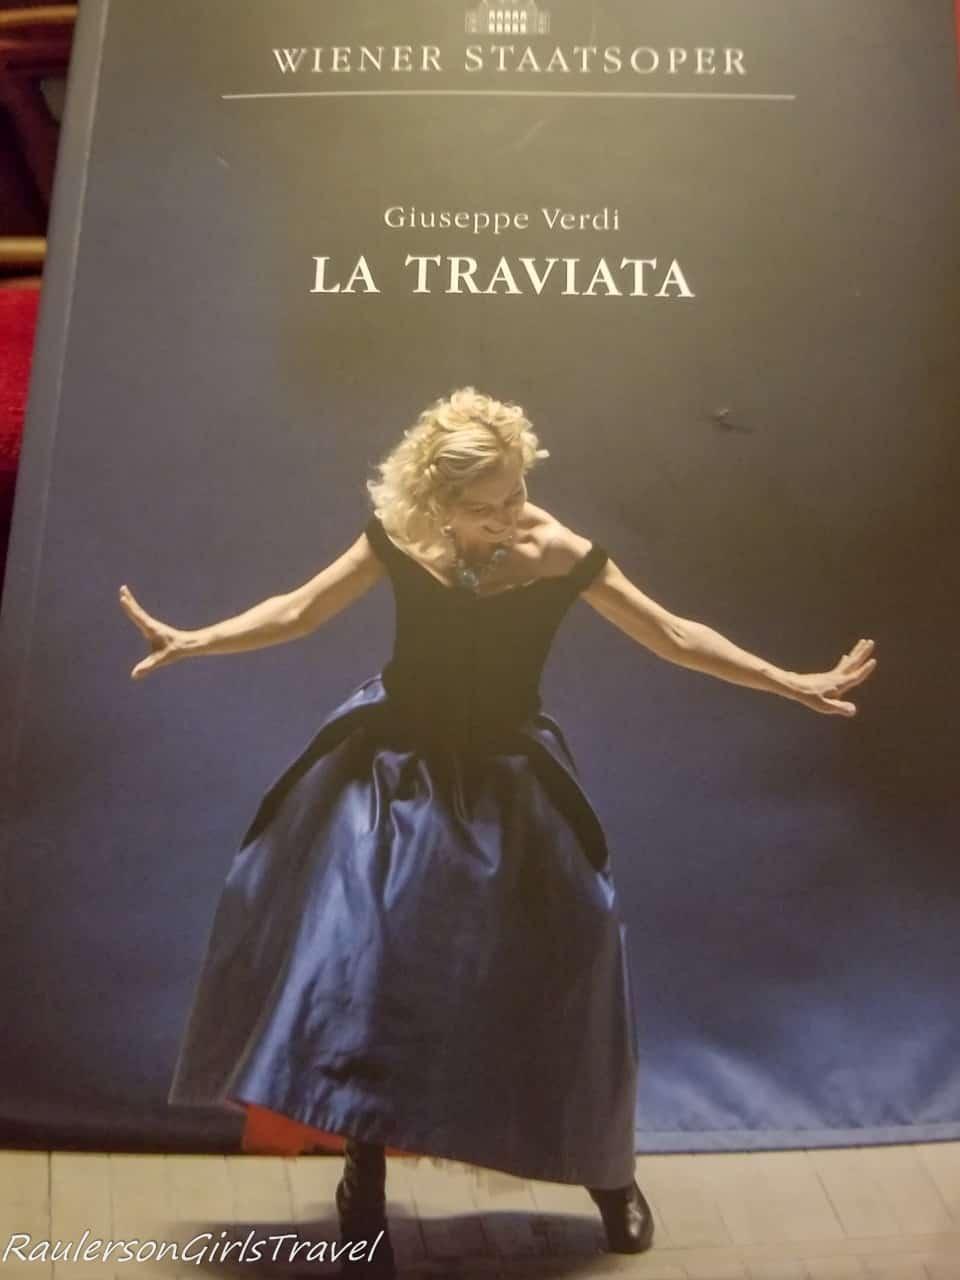 La Traviata at the Vienna State Opera